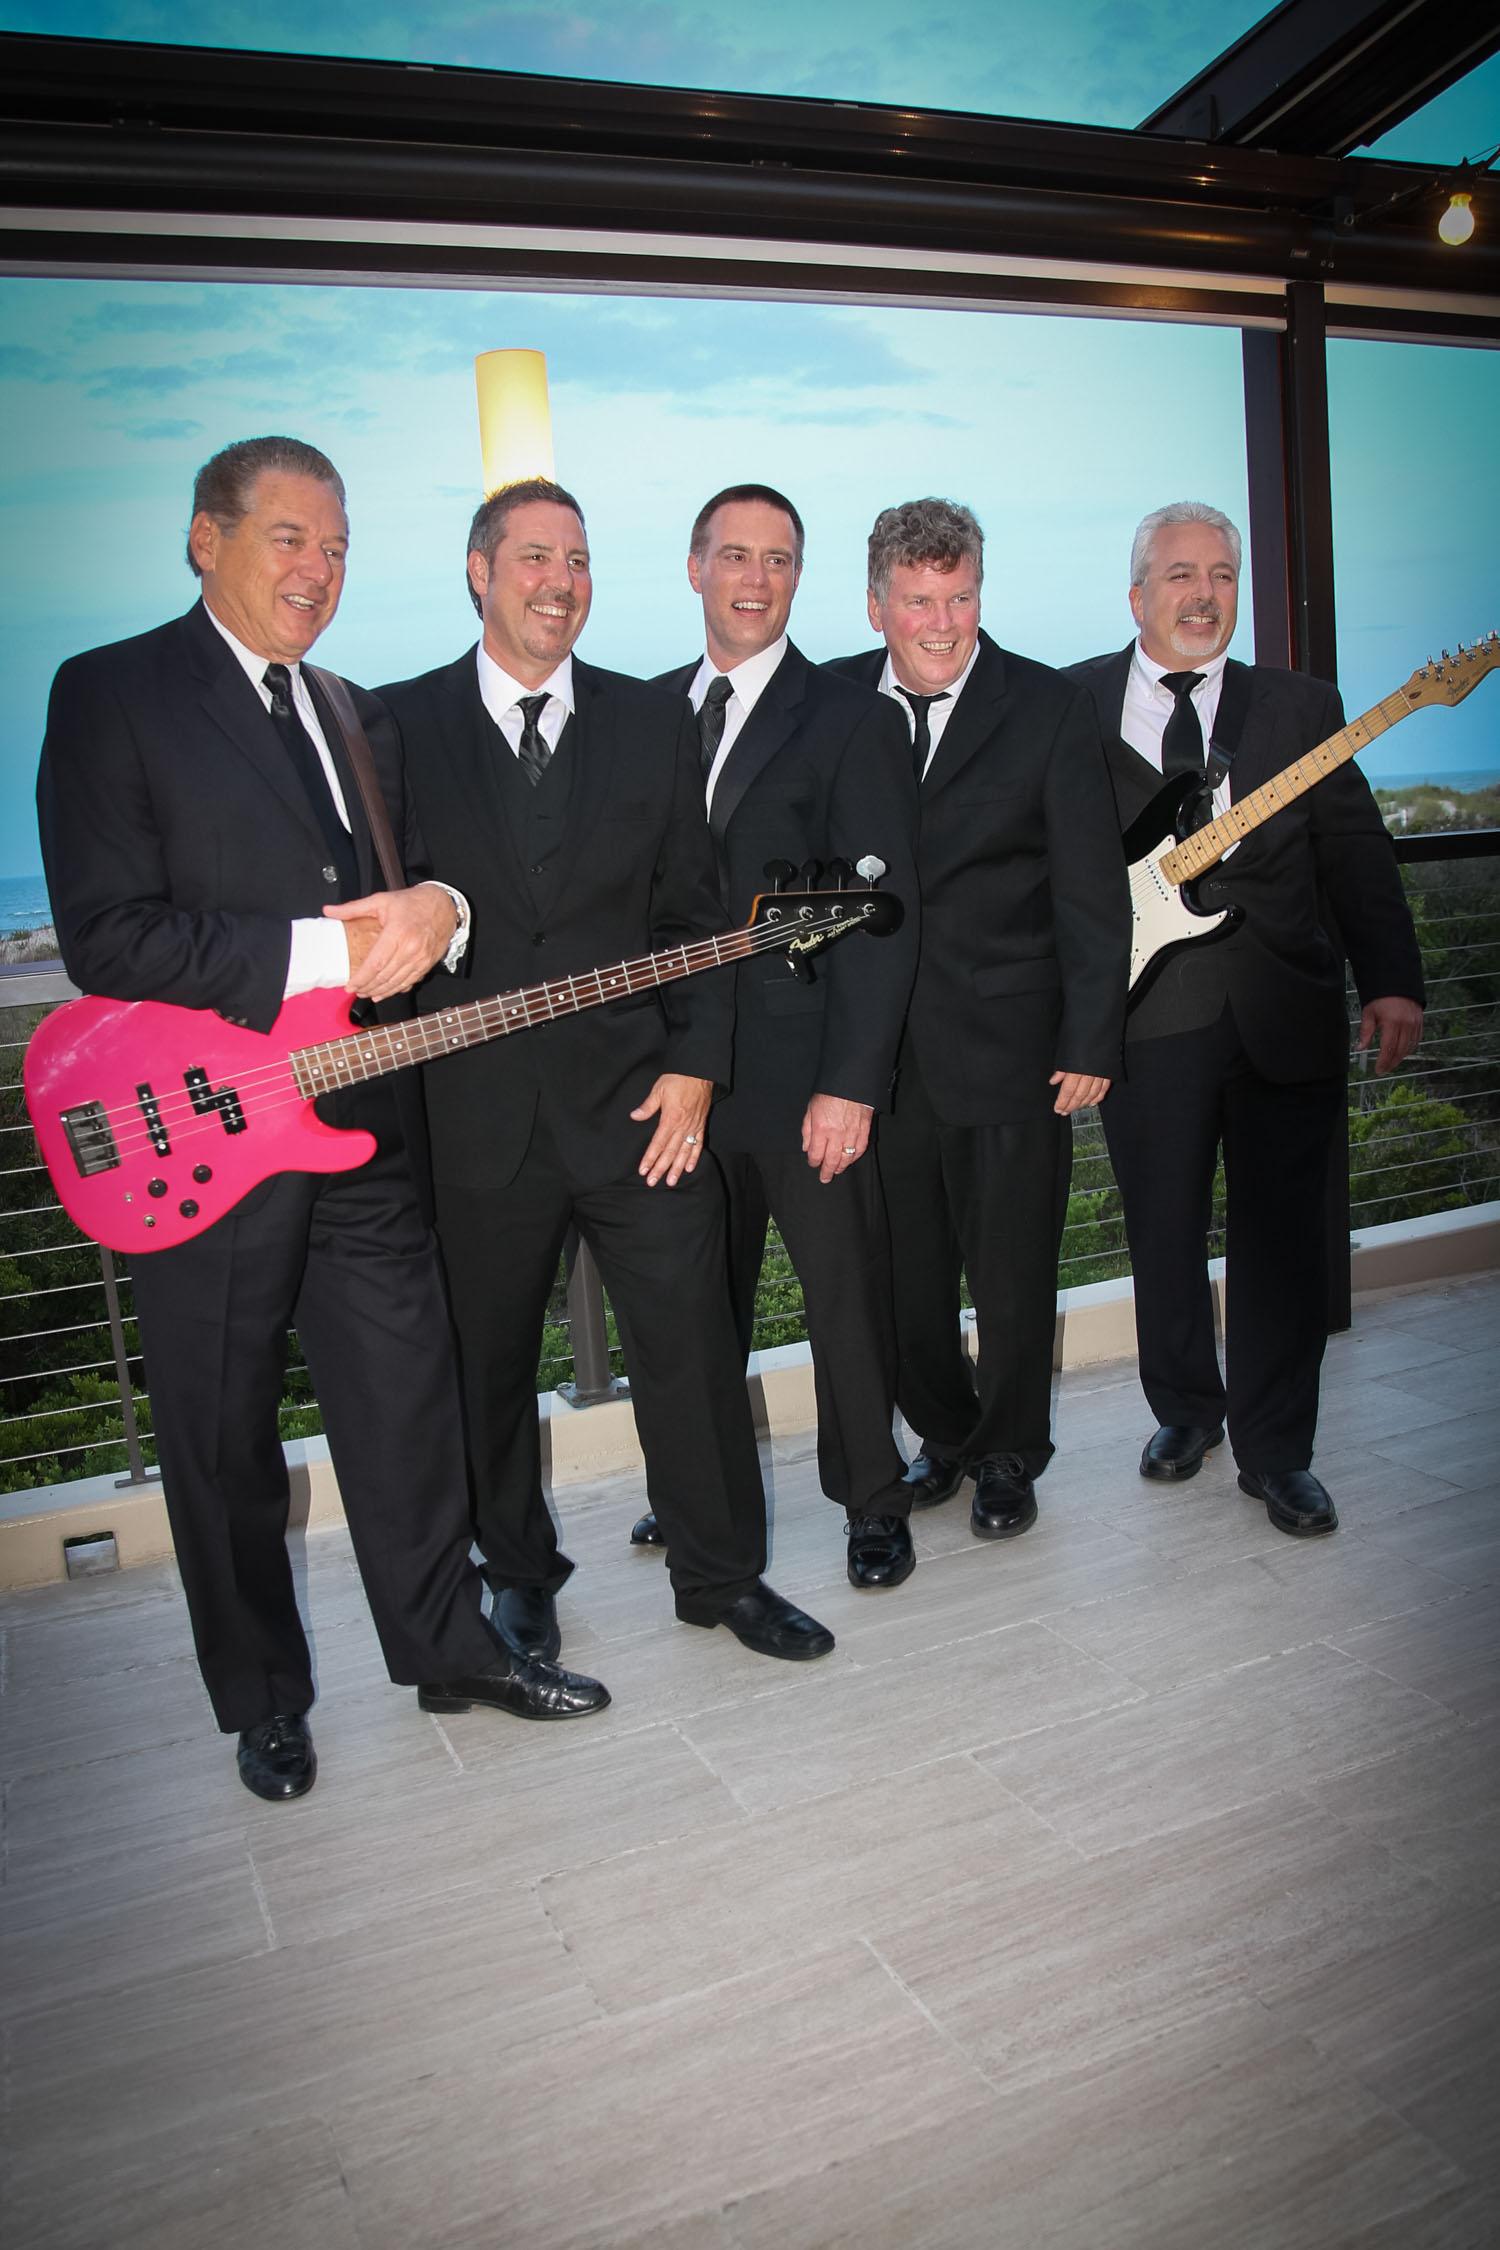 steve-moore-mia-band-suits-12.jpg